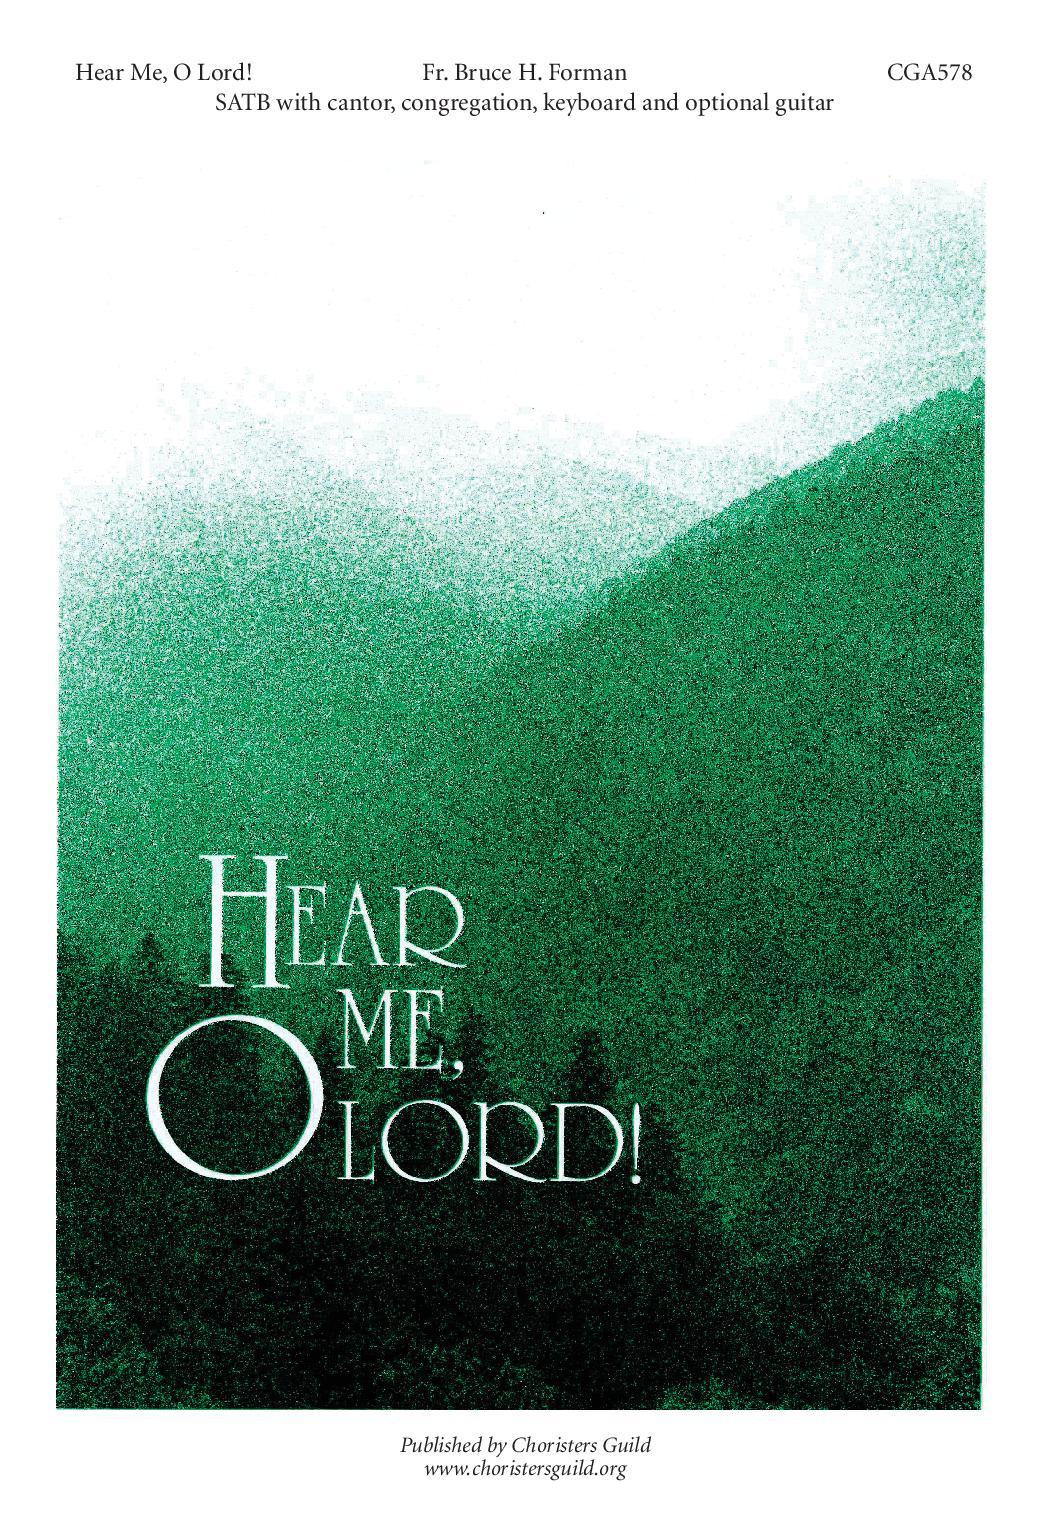 Hear Me, O Lord